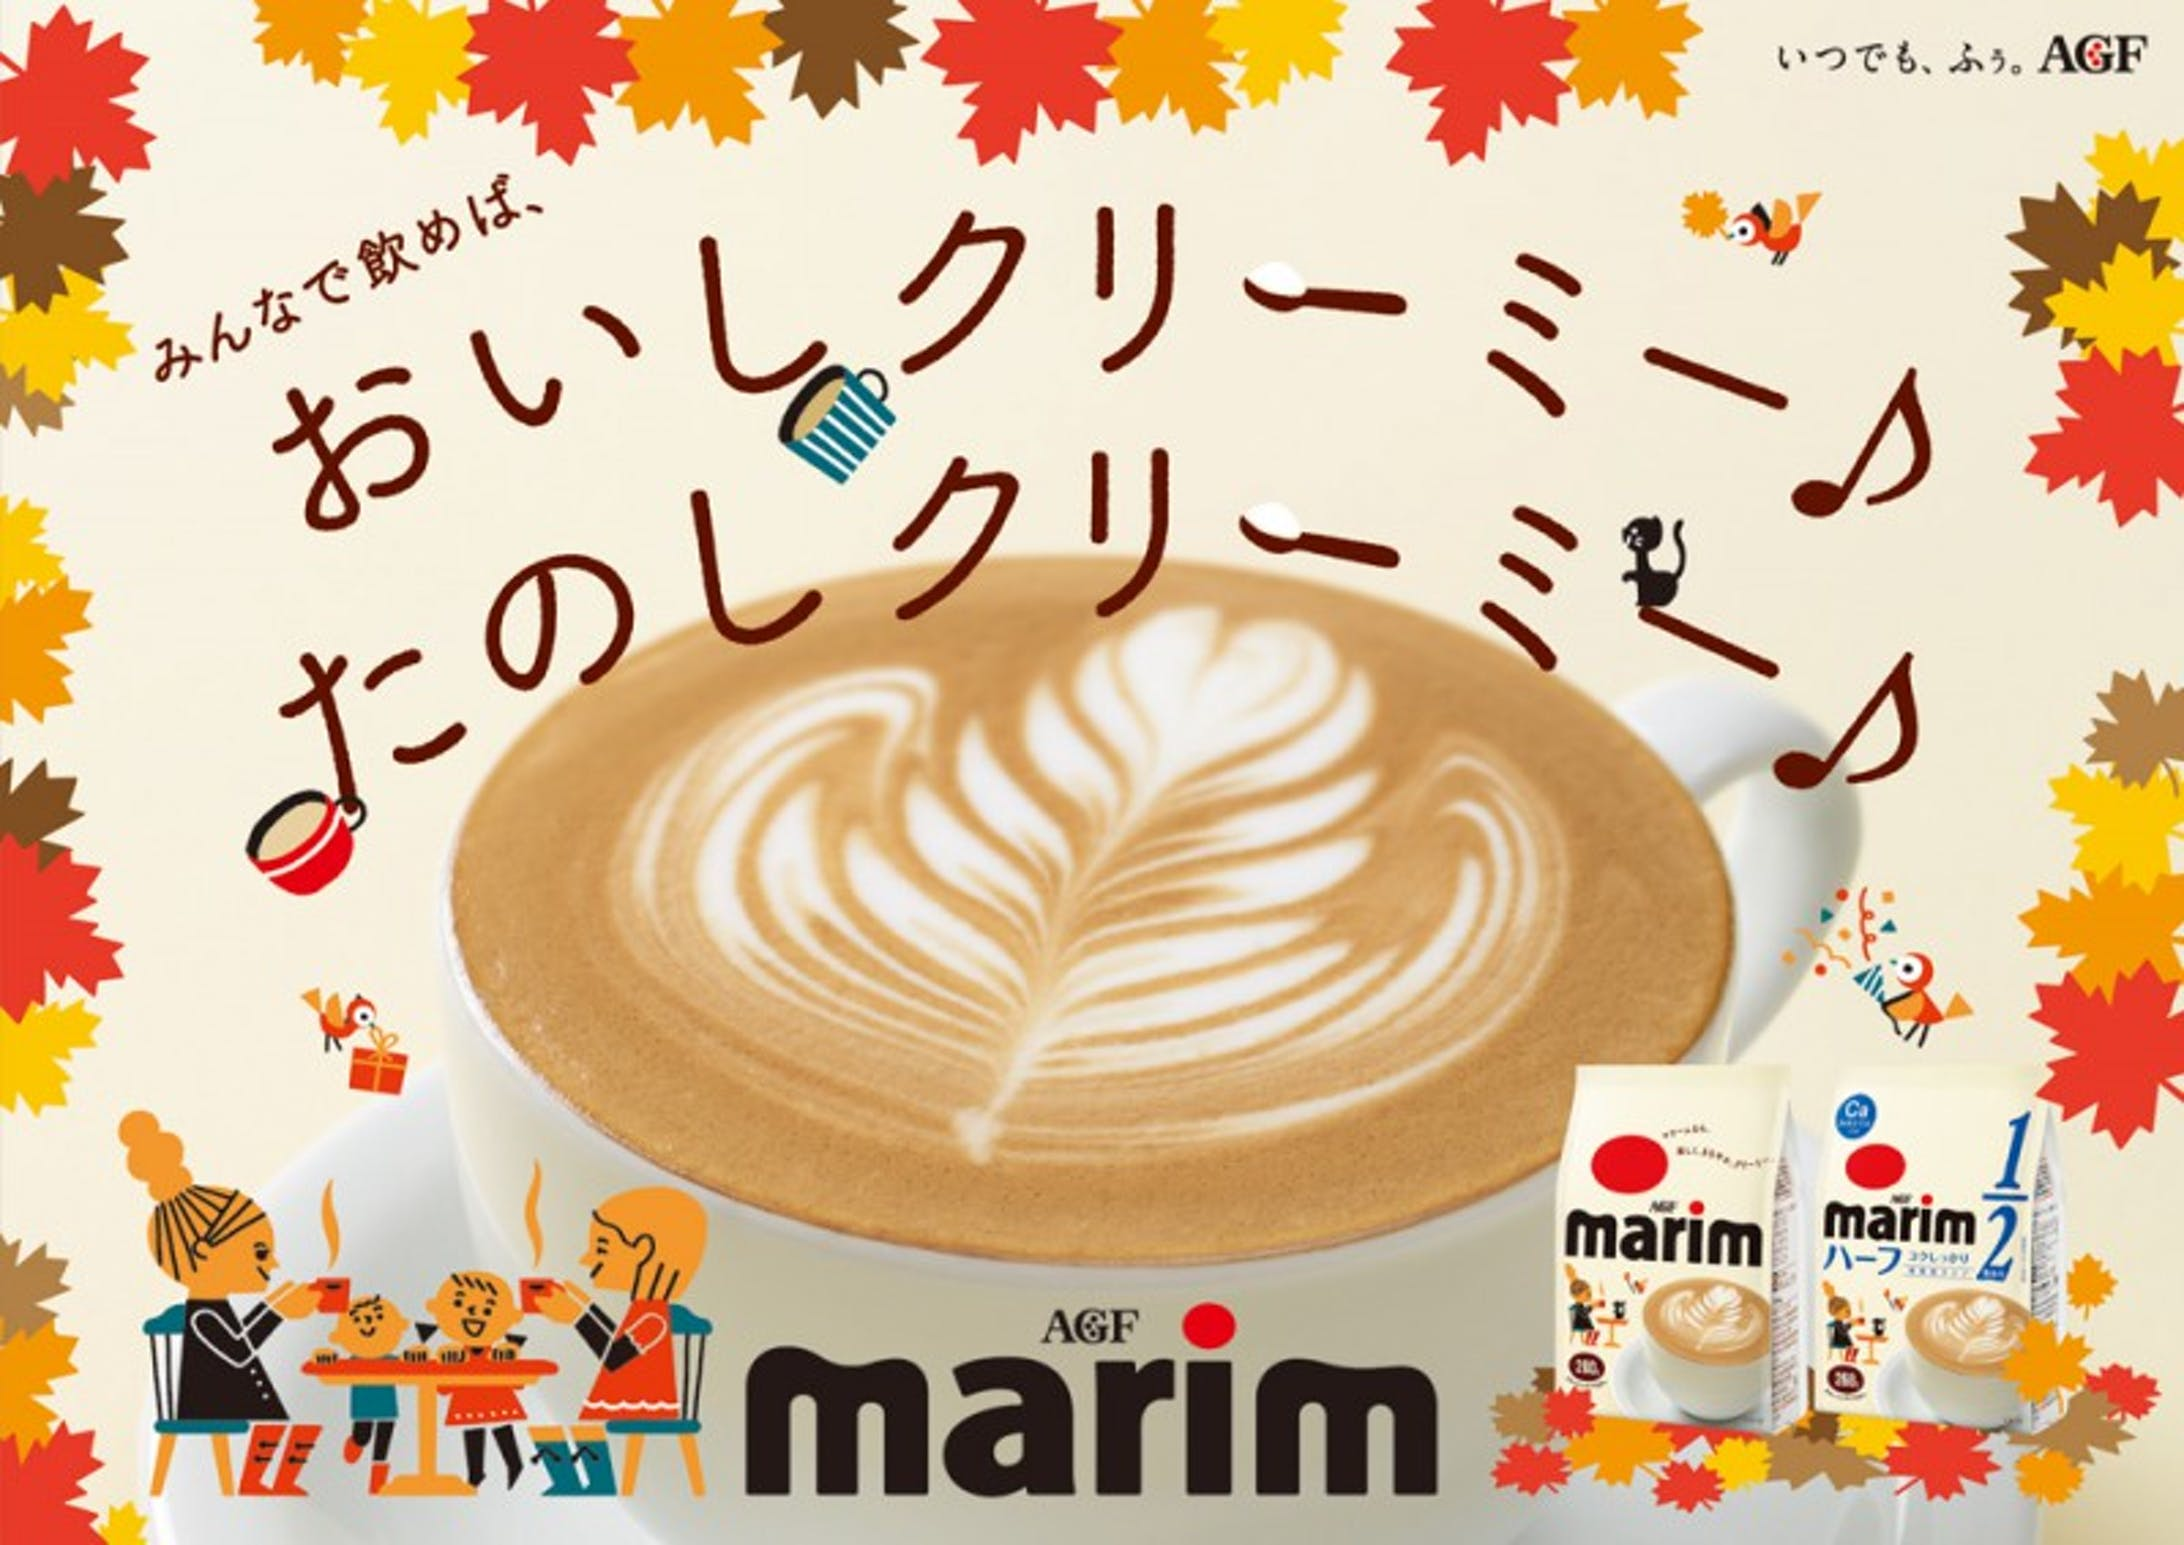 AGF marim パッケージ-5